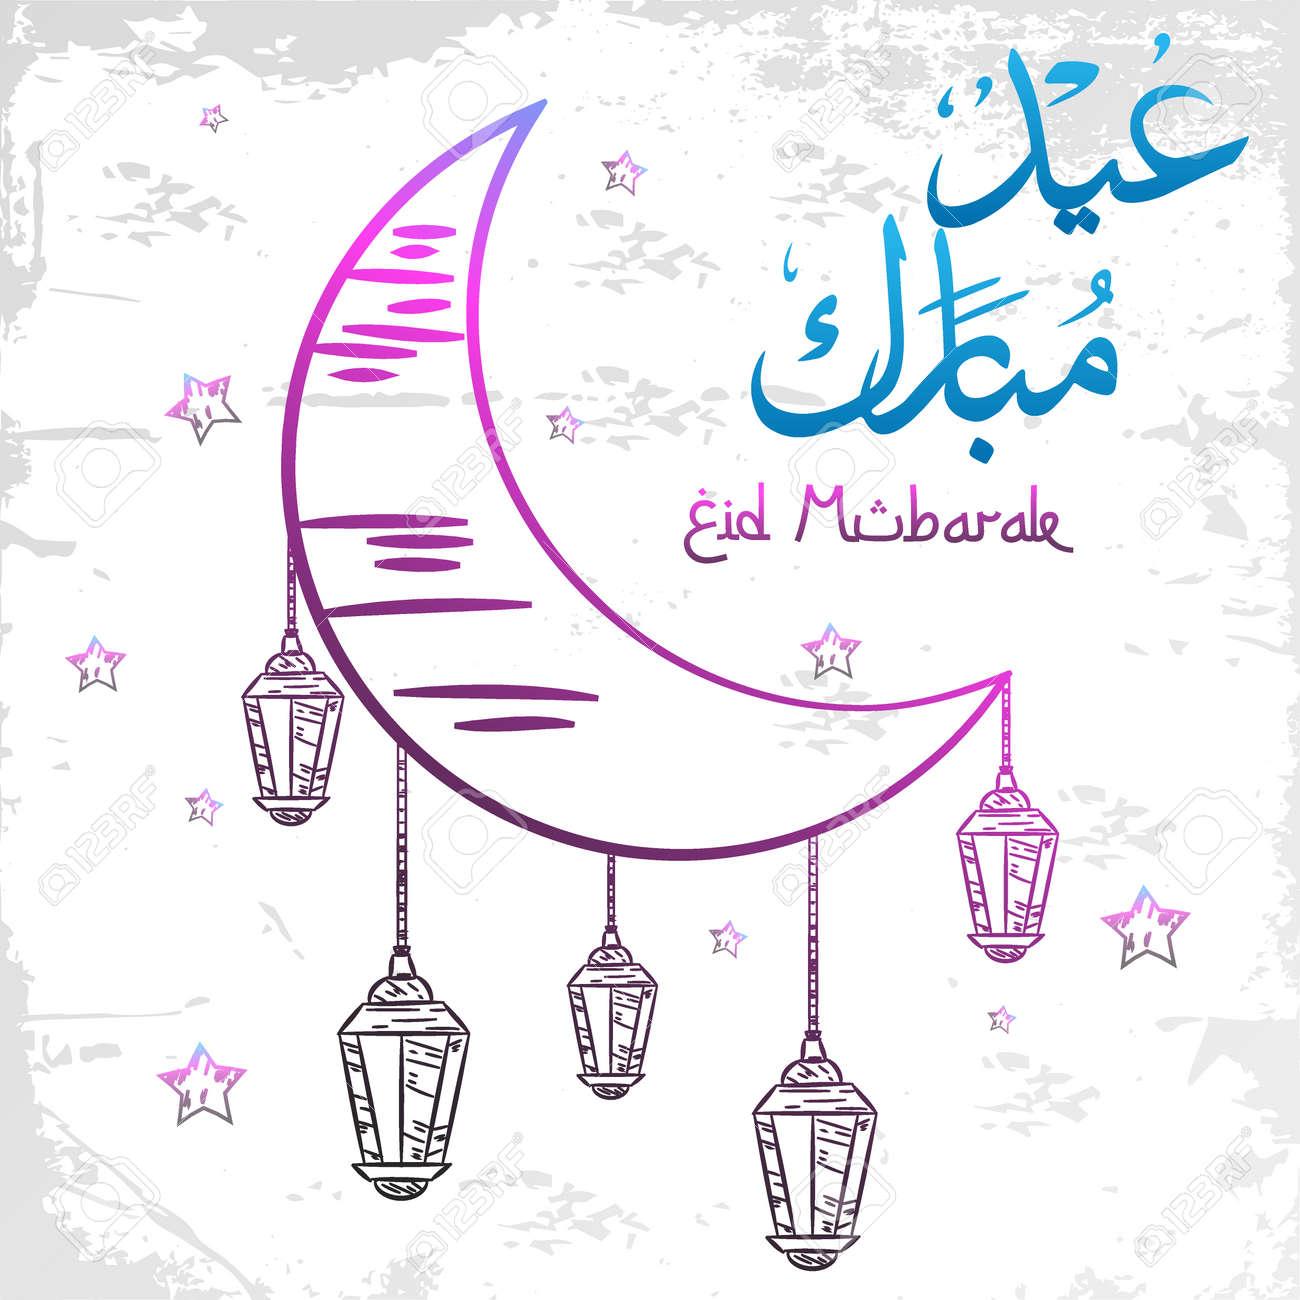 Eid mubarak greeting card on doodle style - 168266575